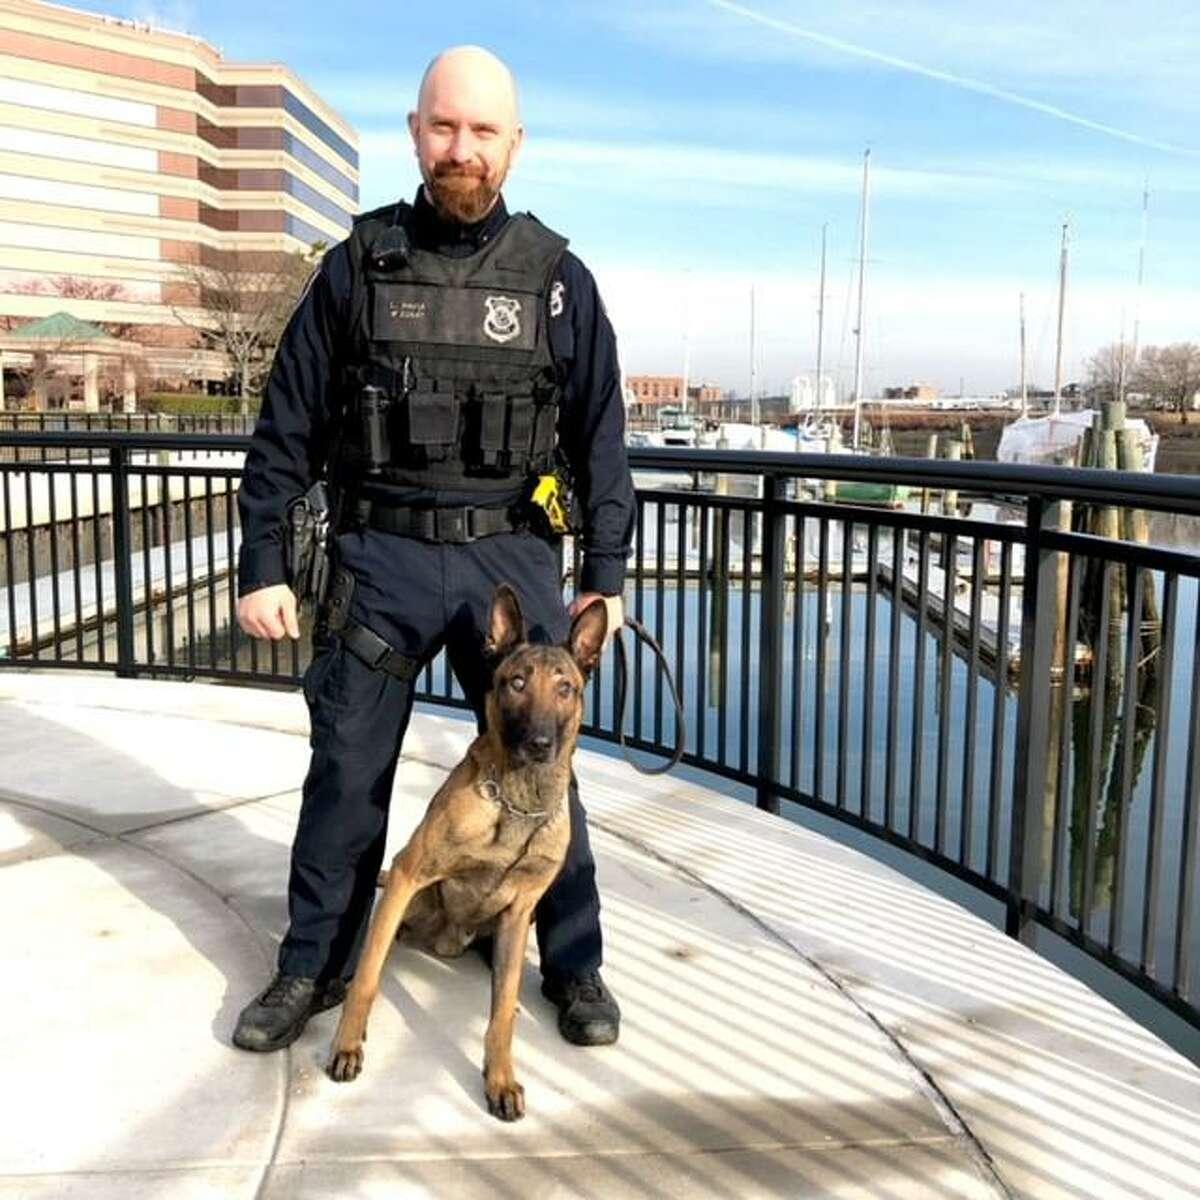 K-9 officer Logan Pavia responded to a burglary on Thursday, Sept. 20 on Davenport Drive, Stamford, Conn.